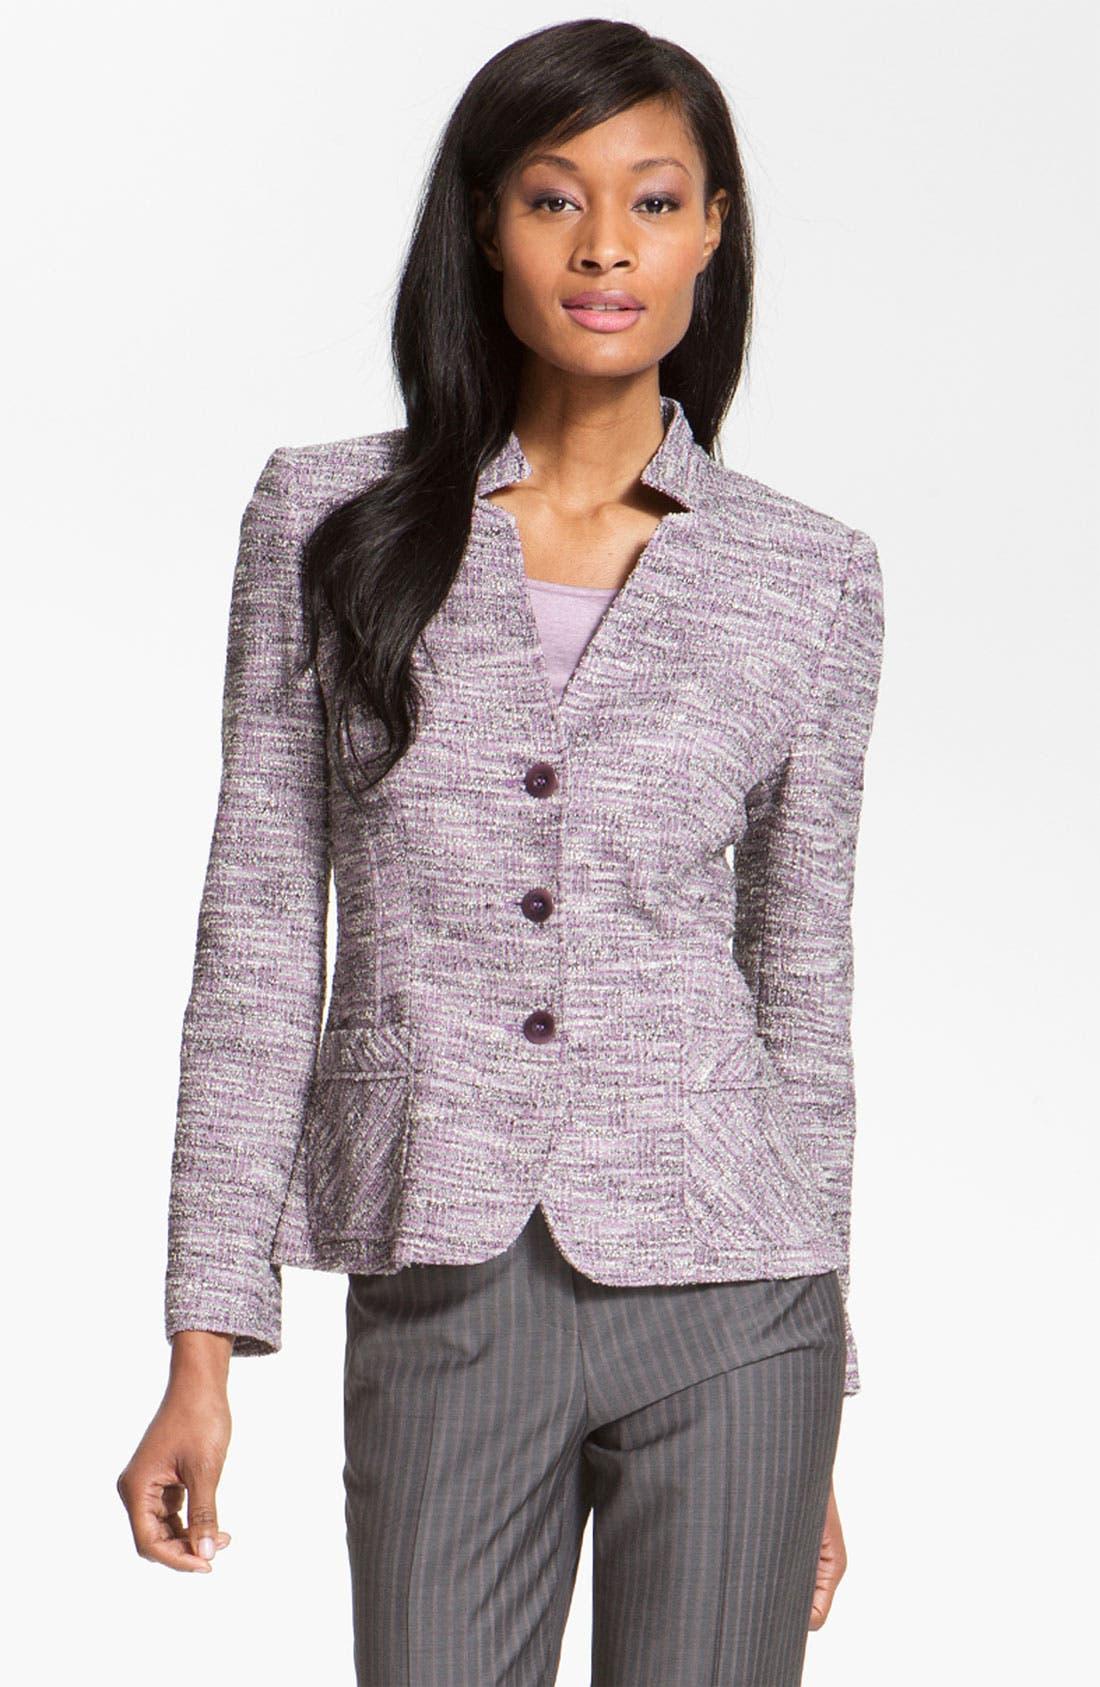 Alternate Image 1 Selected - Santorelli 'Dina' Jacket